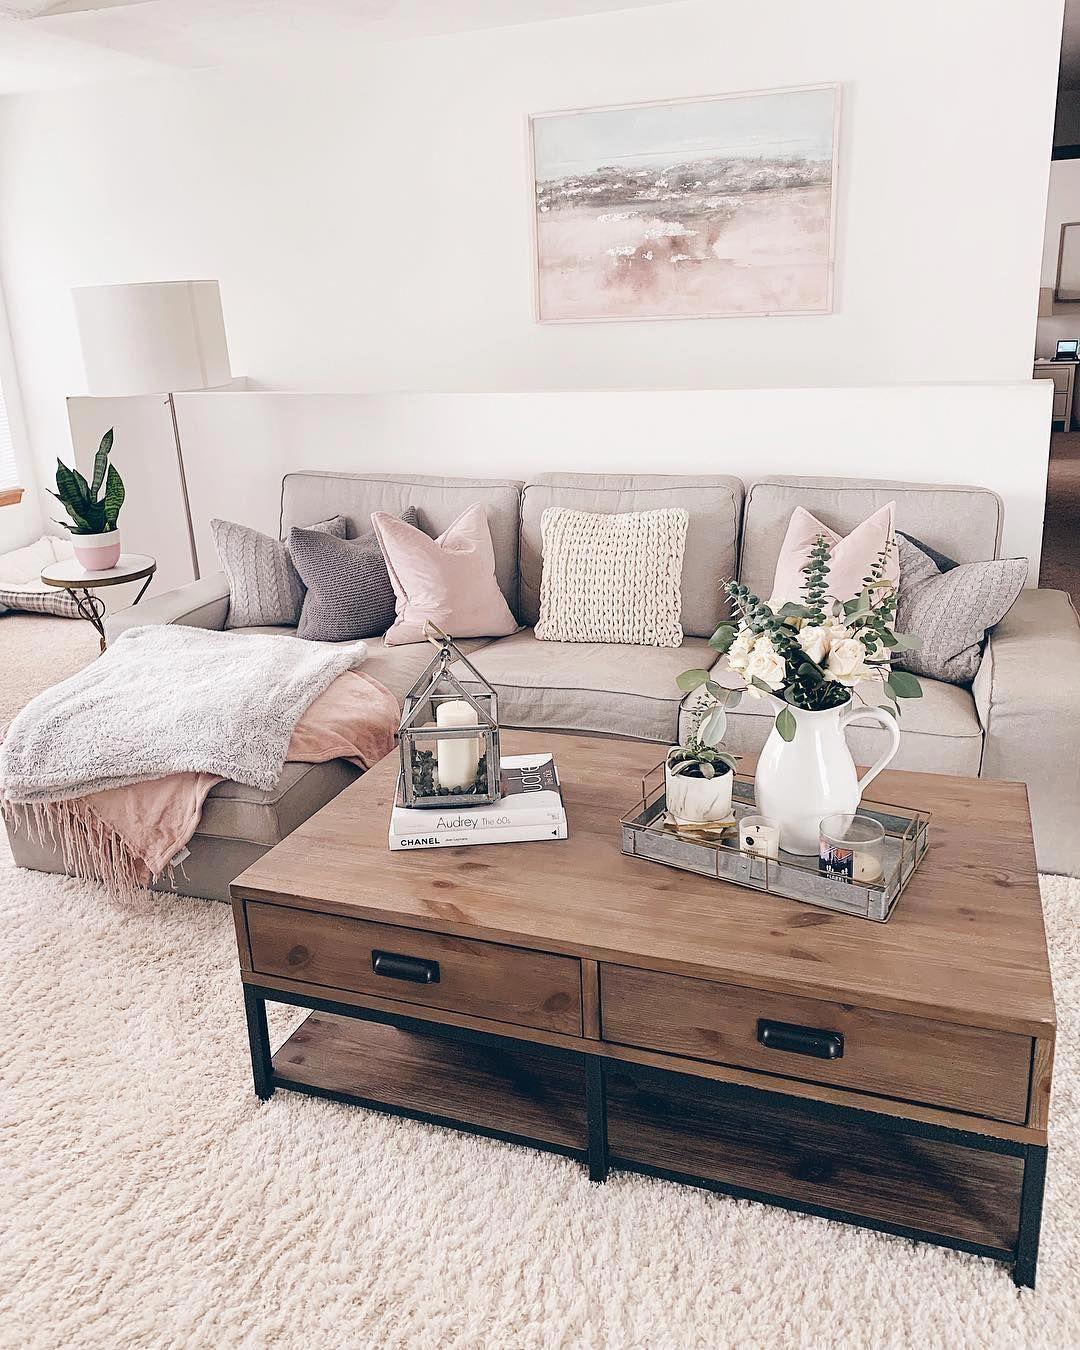 Living room decor ideas modern  rustic home acessories for modernhomedecorlivingroom also rh pinterest